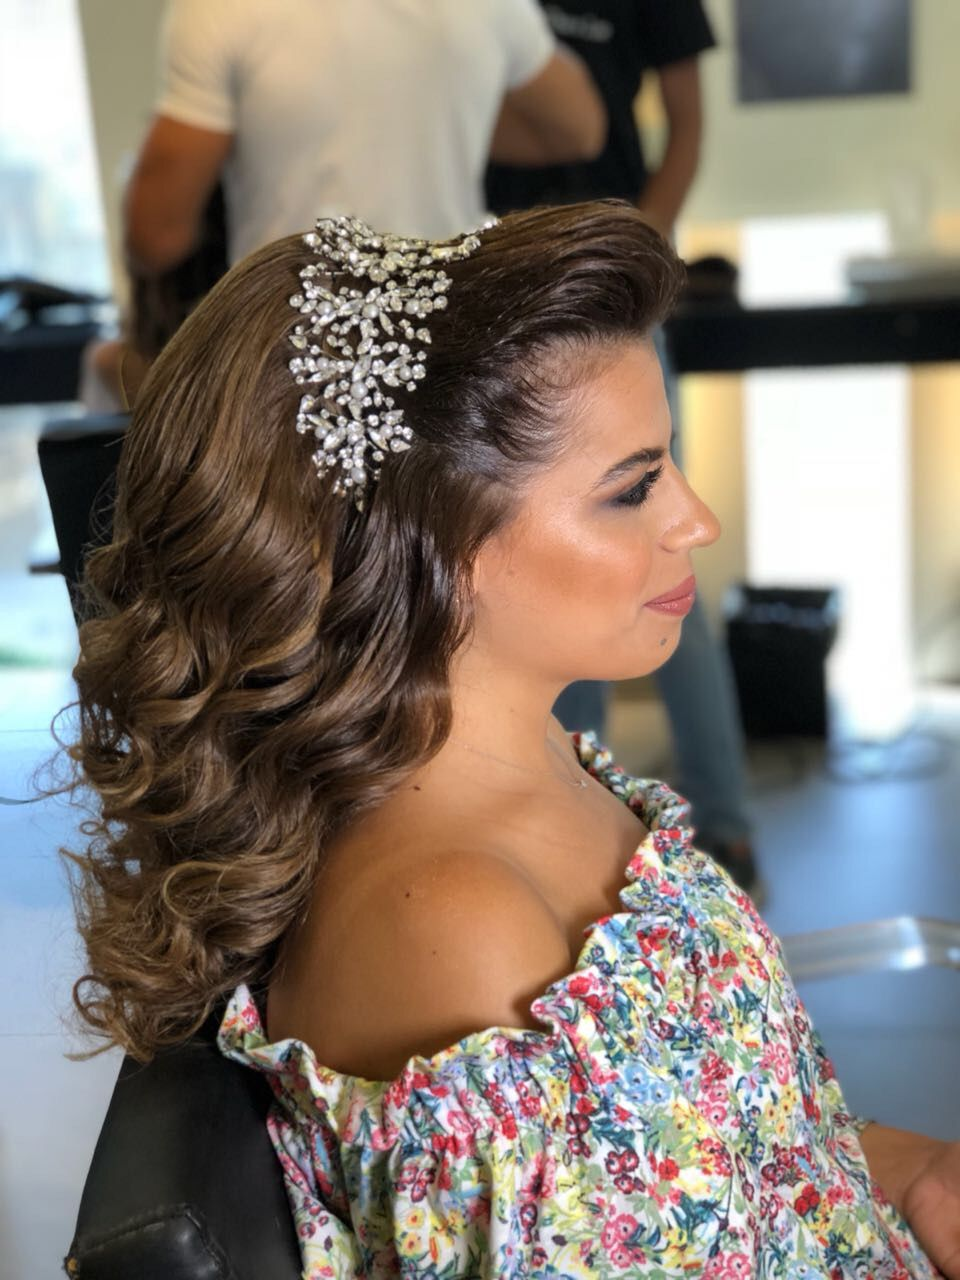 pin by khawla kareem on makeup in 2019 | hair styles, short